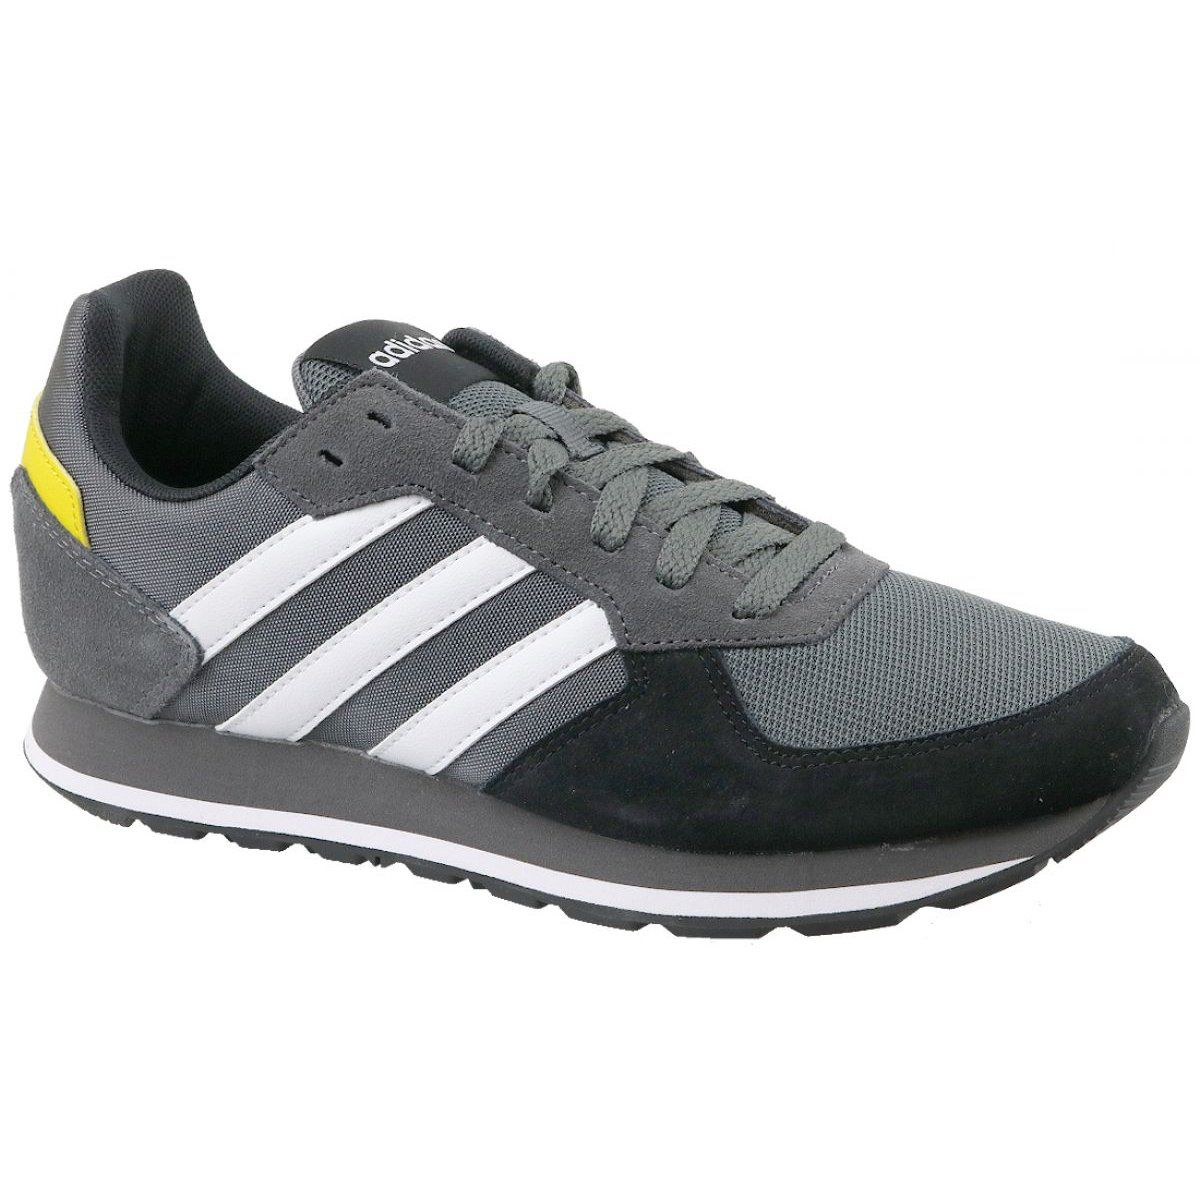 Sportowe Meskie Adidas Szare Buty Adidas 8k M Db1731 Shoes Adidas Sneakers Sneakers